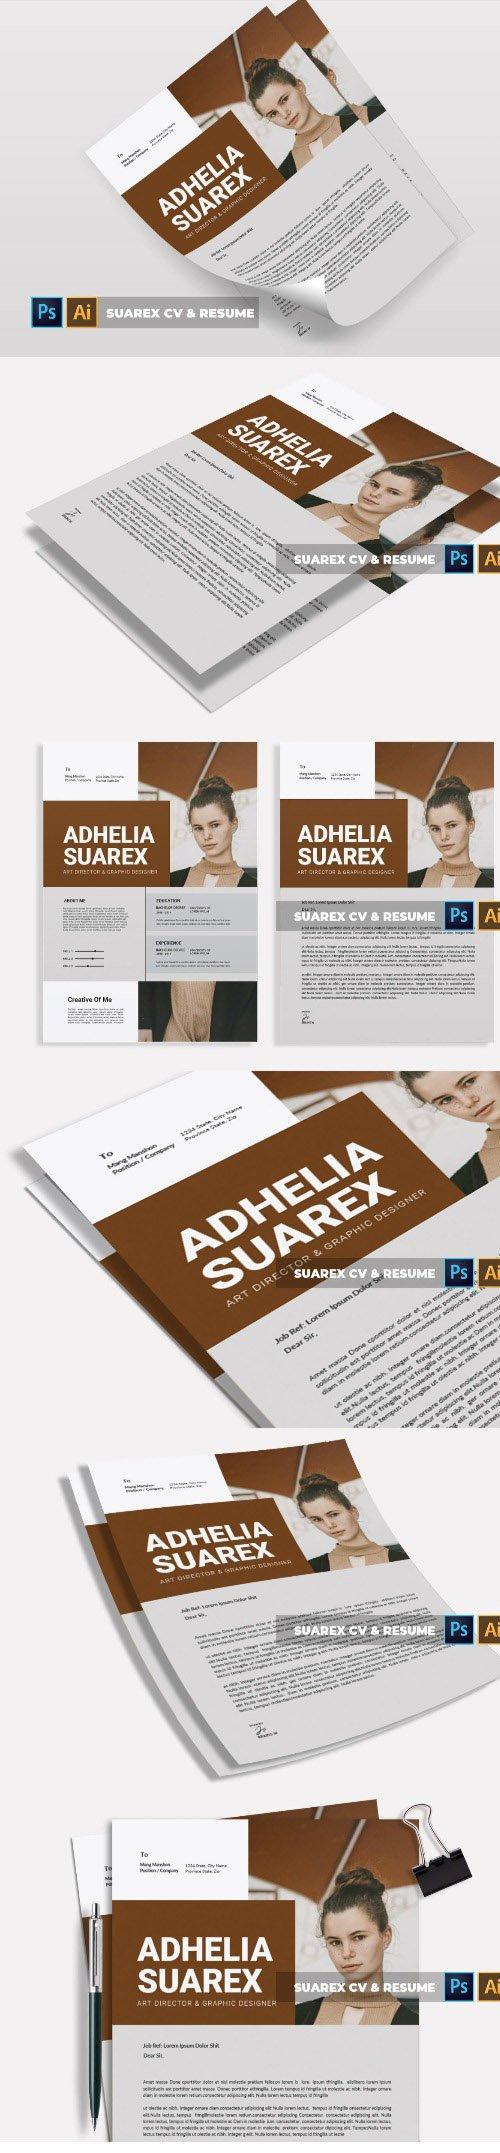 Suarex | CV & Resume